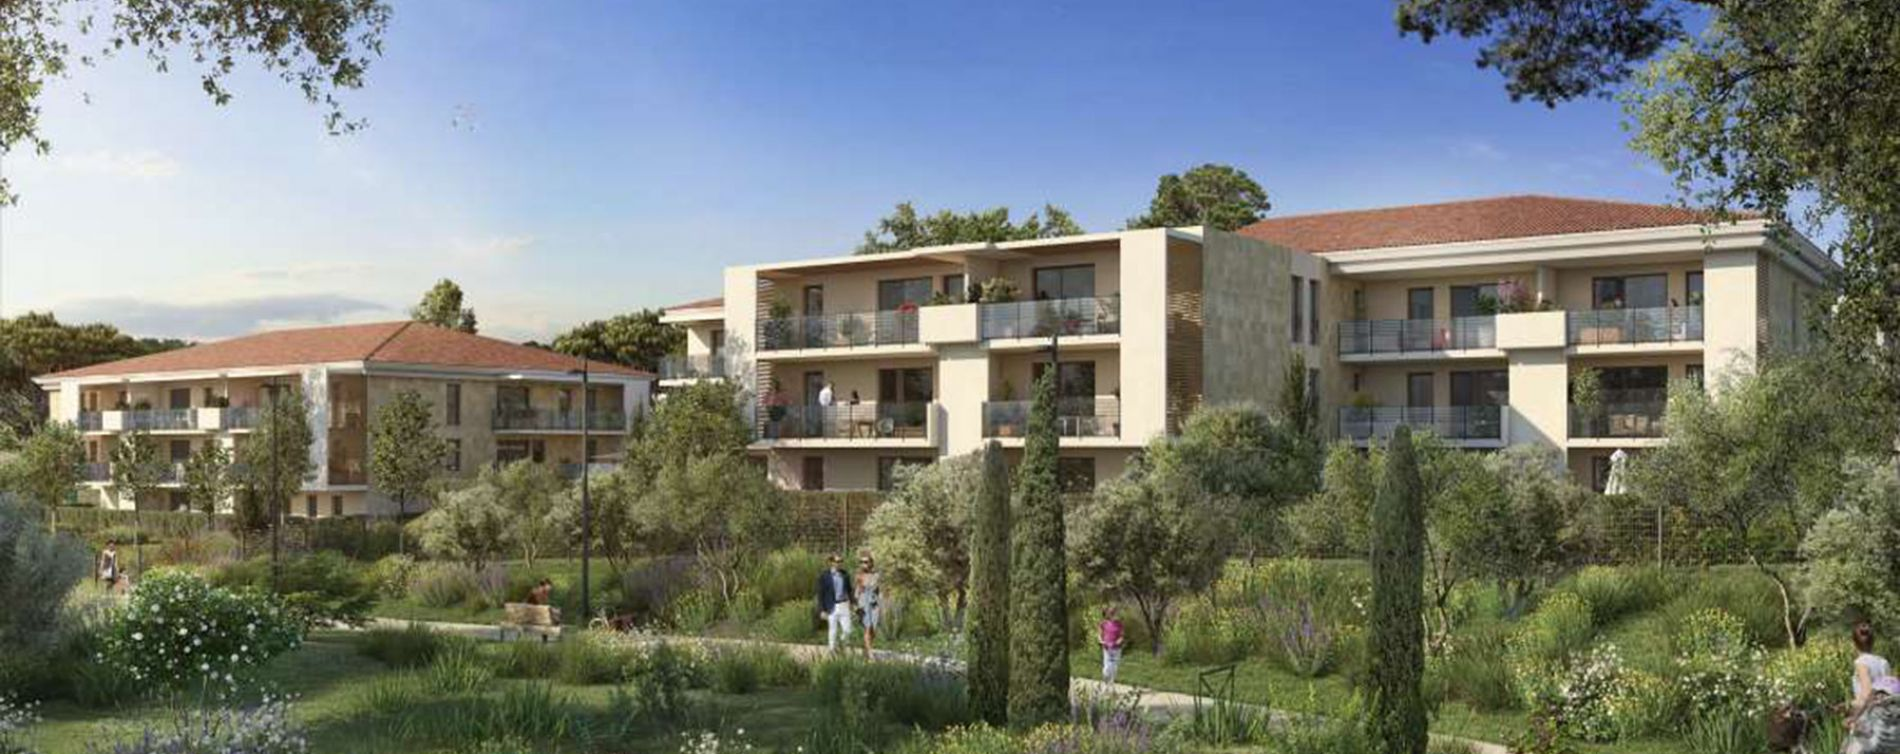 Aix-en-Provence : programme immobilier neuve « Villa Oleia » en Loi Pinel